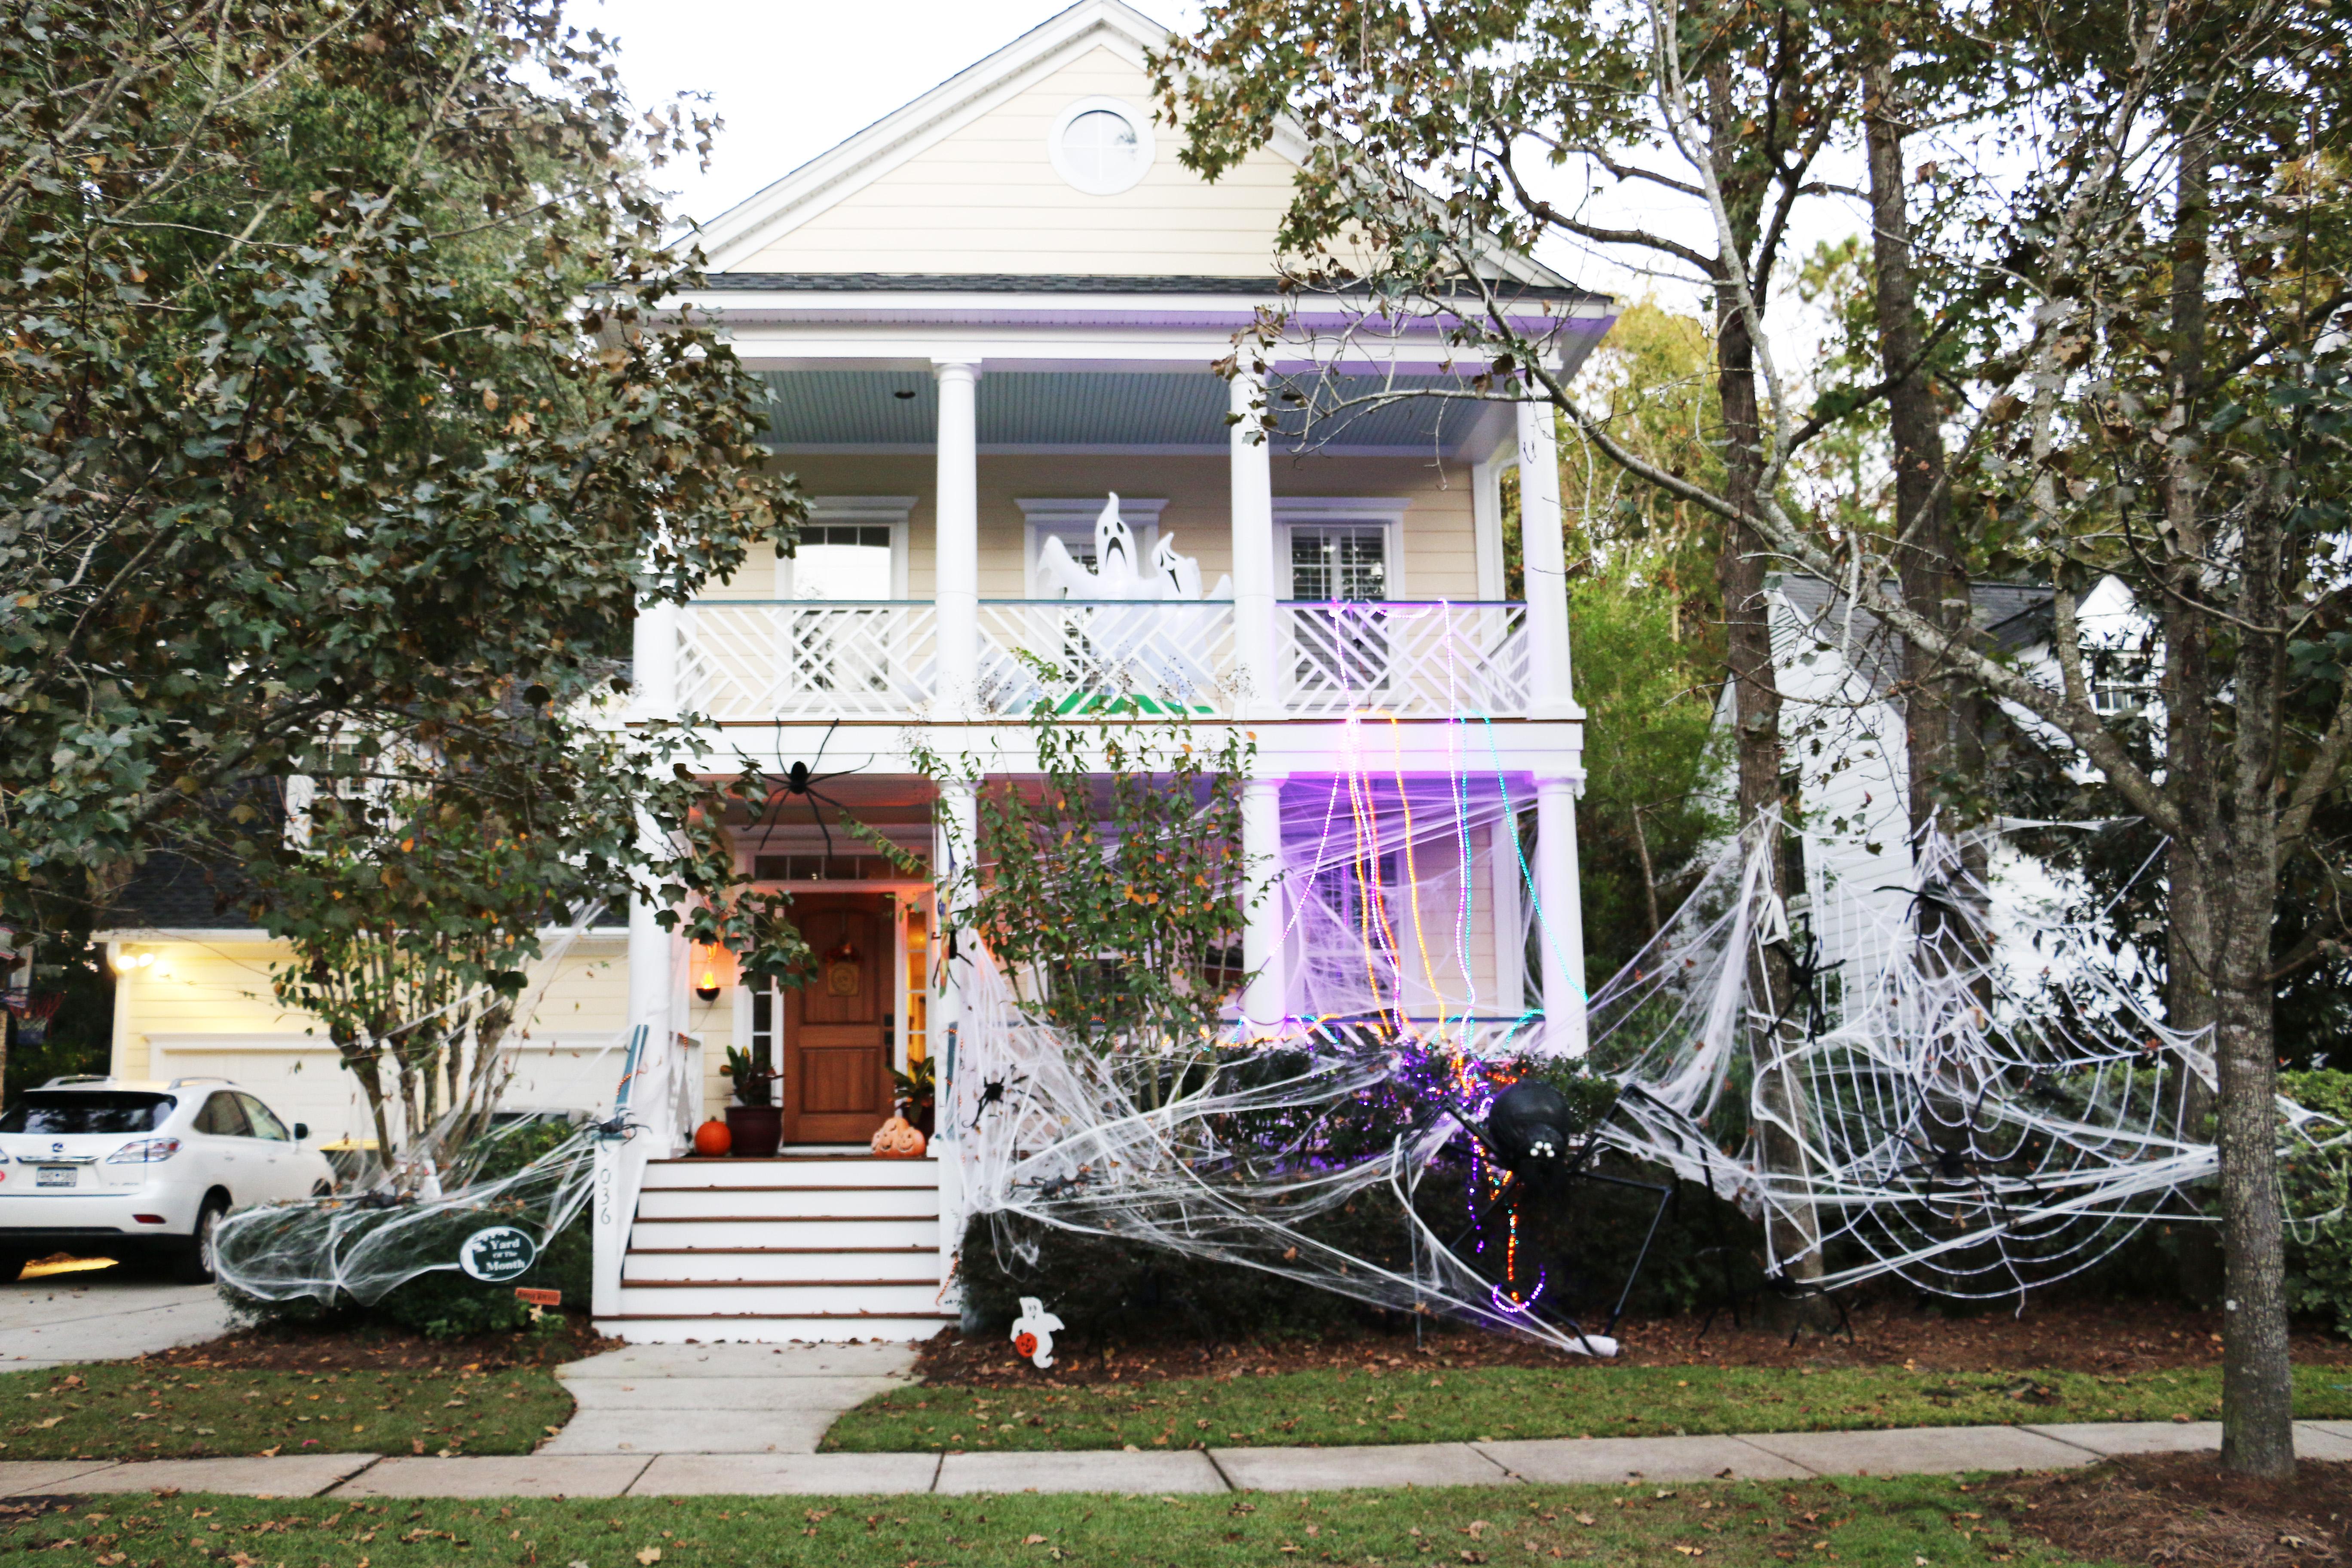 1036 Barfield Street - The Bush Family